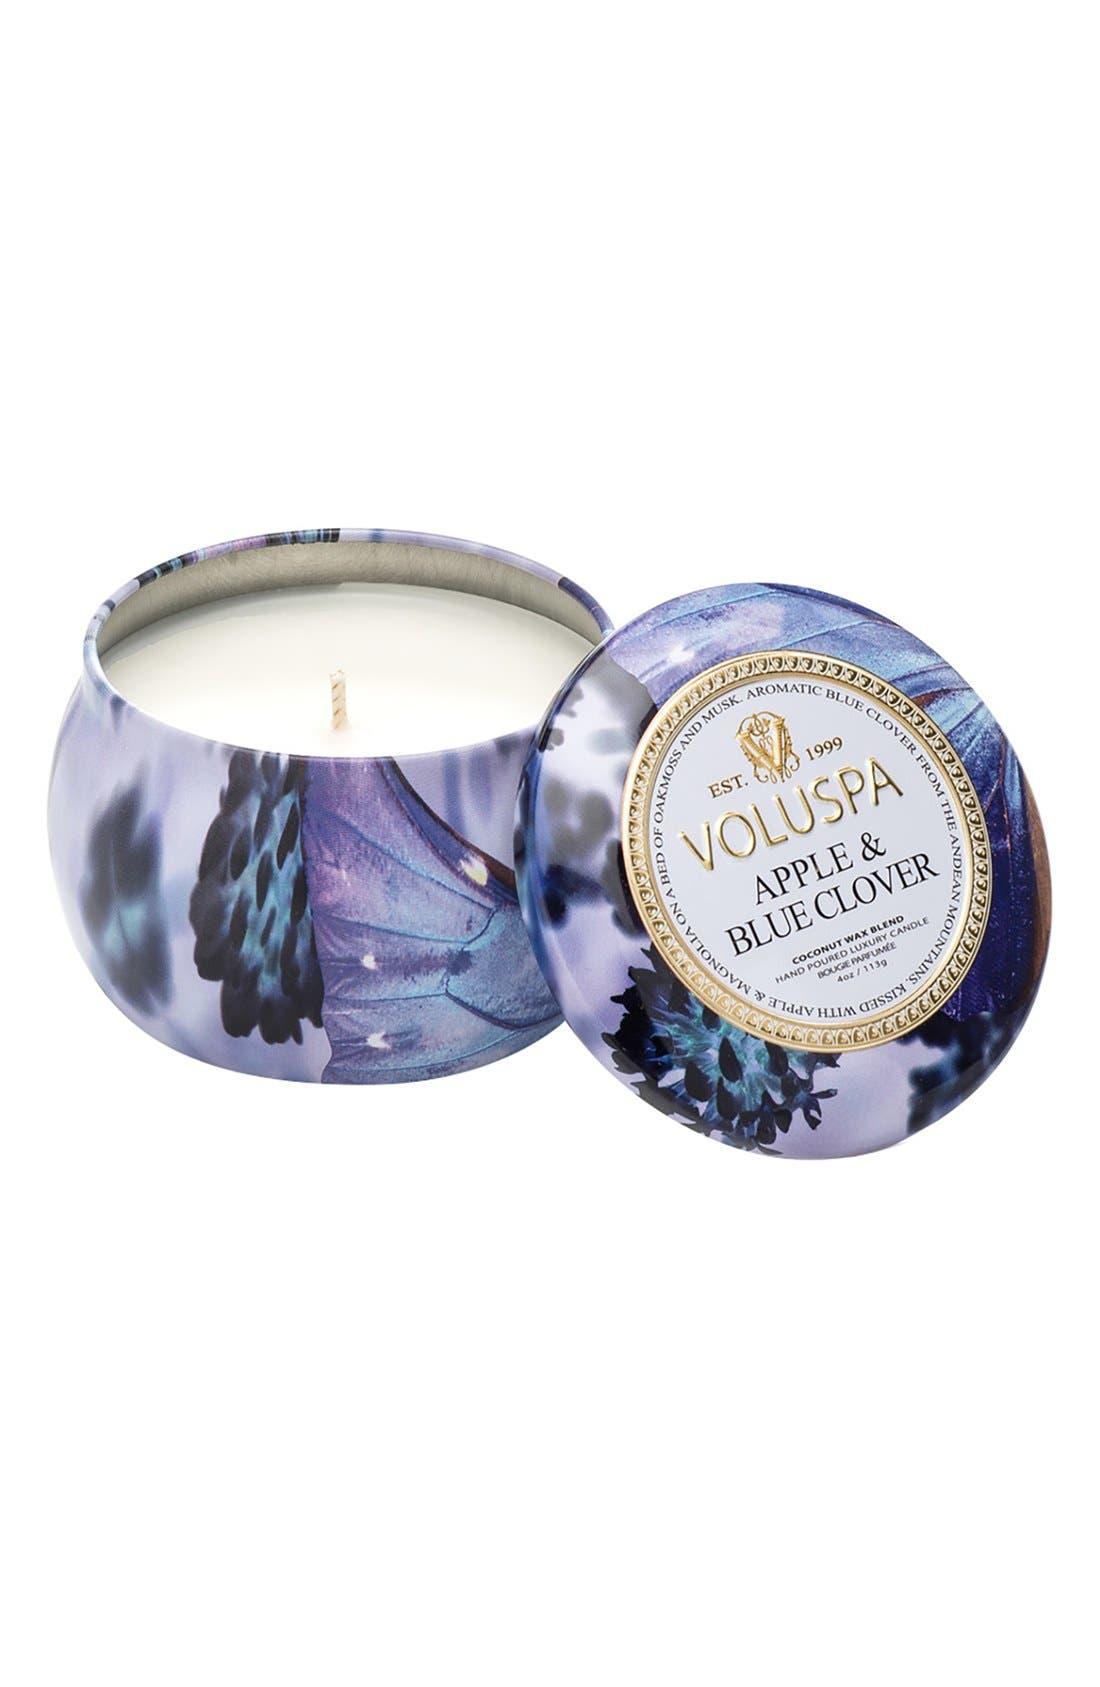 Alternate Image 1 Selected - Voluspa 'Maison Jardin' Mini Decorative Tin Candle